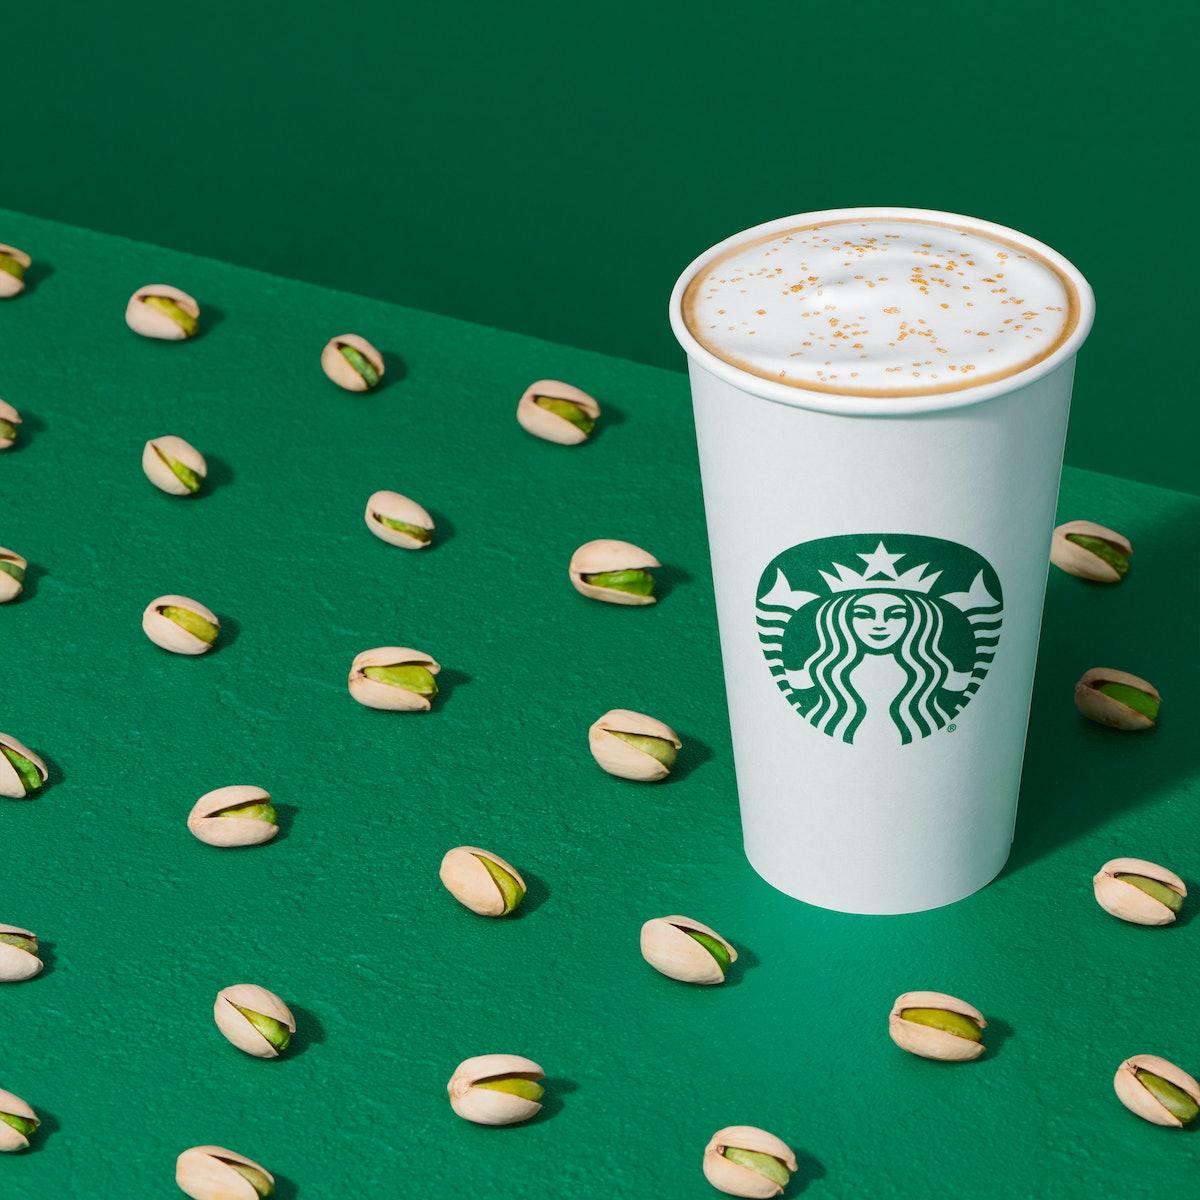 Starbucks' new winter 2021 drinks include a non-dairy cold brew and a unique latte.